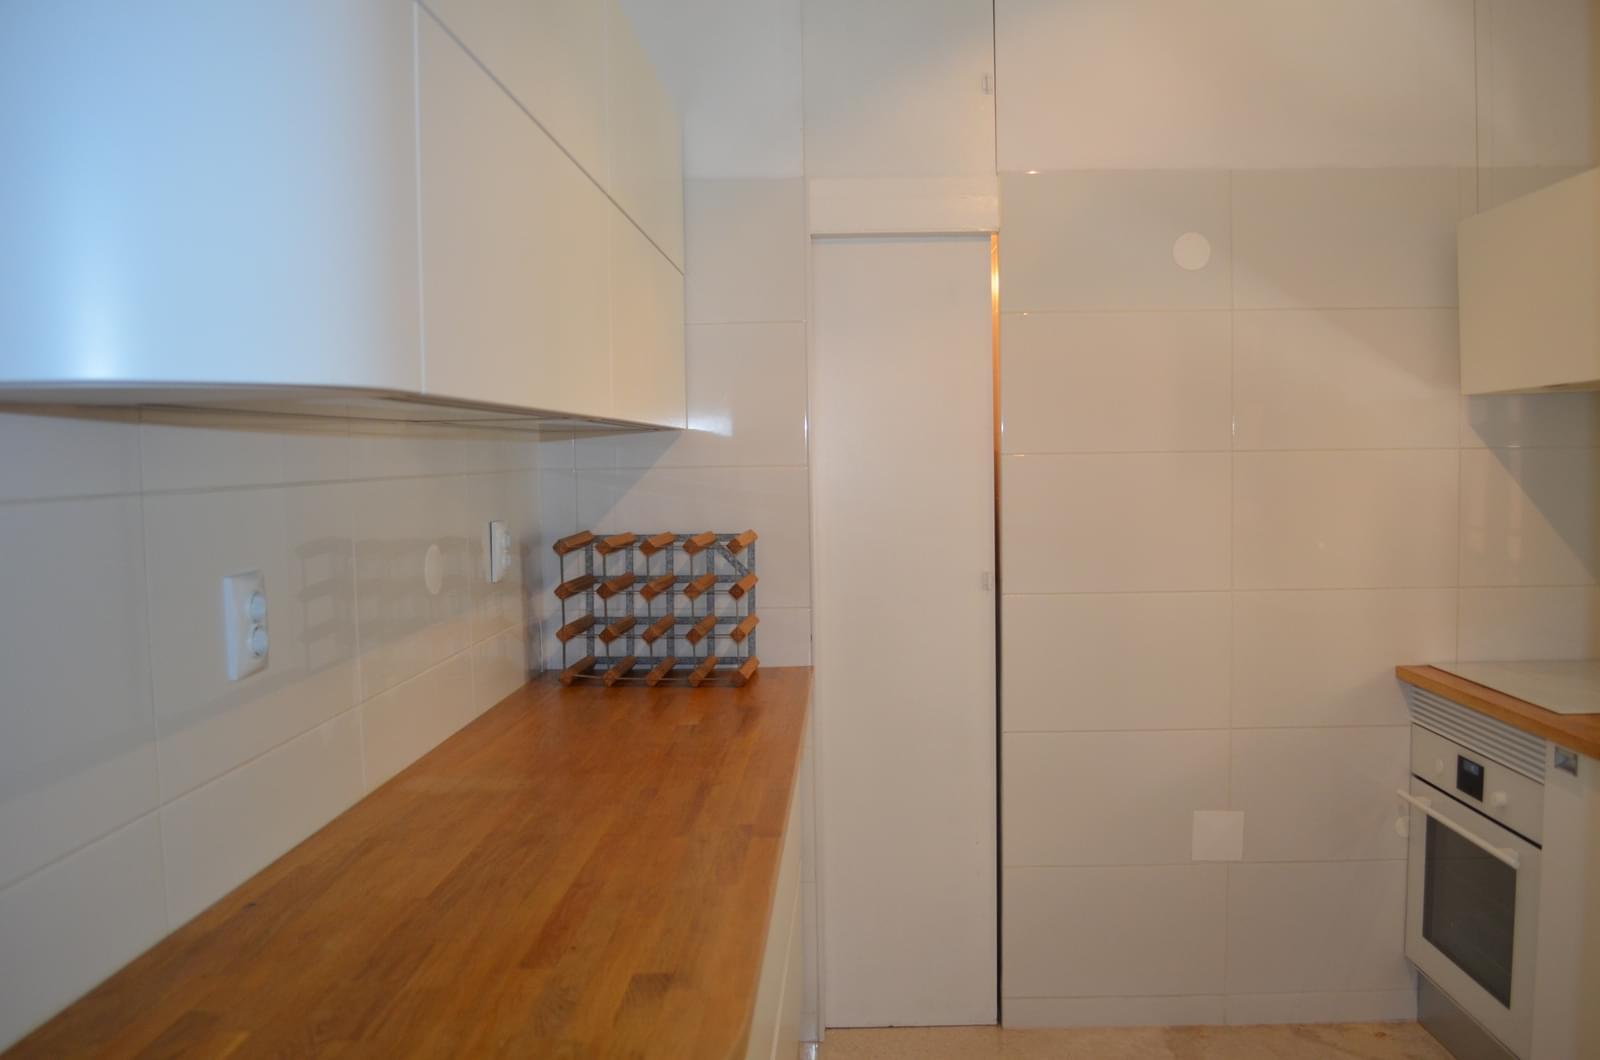 pf17565-apartamento-t3-lisboa-f9366b35-13e1-49c1-8617-01e94719d205